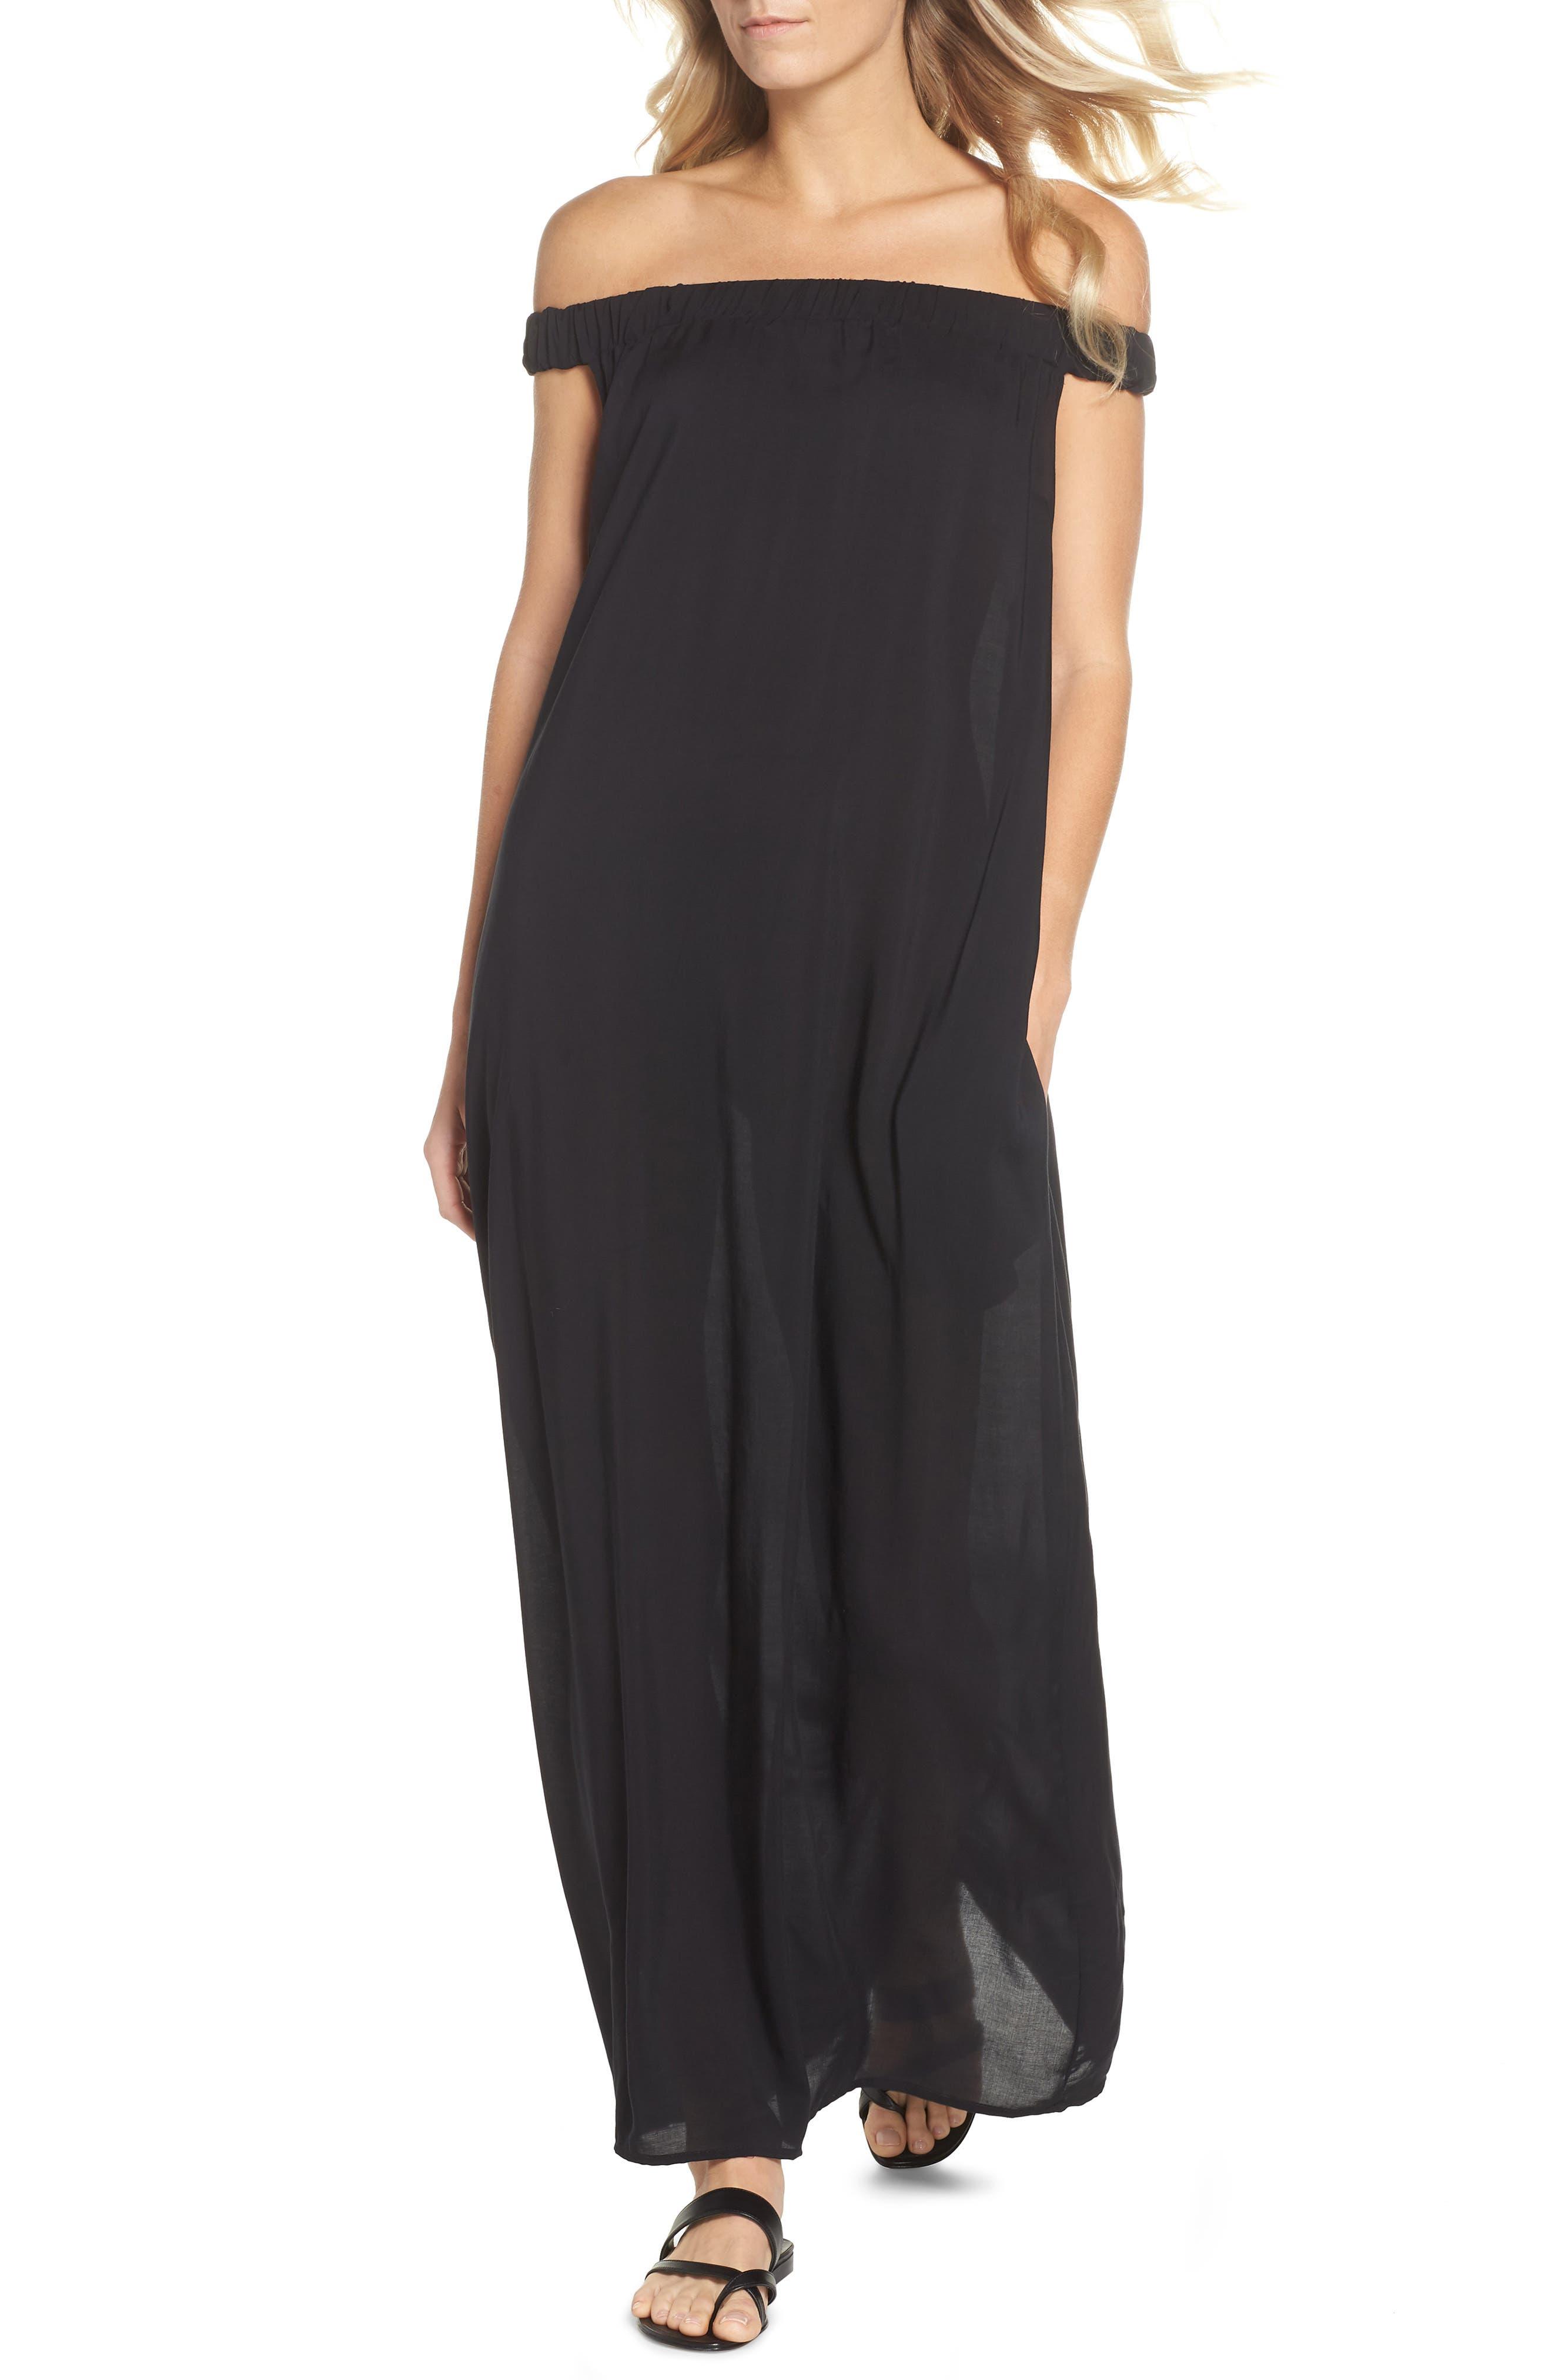 Elan Off The Shoulder Cover-Up Maxi Dress, Black